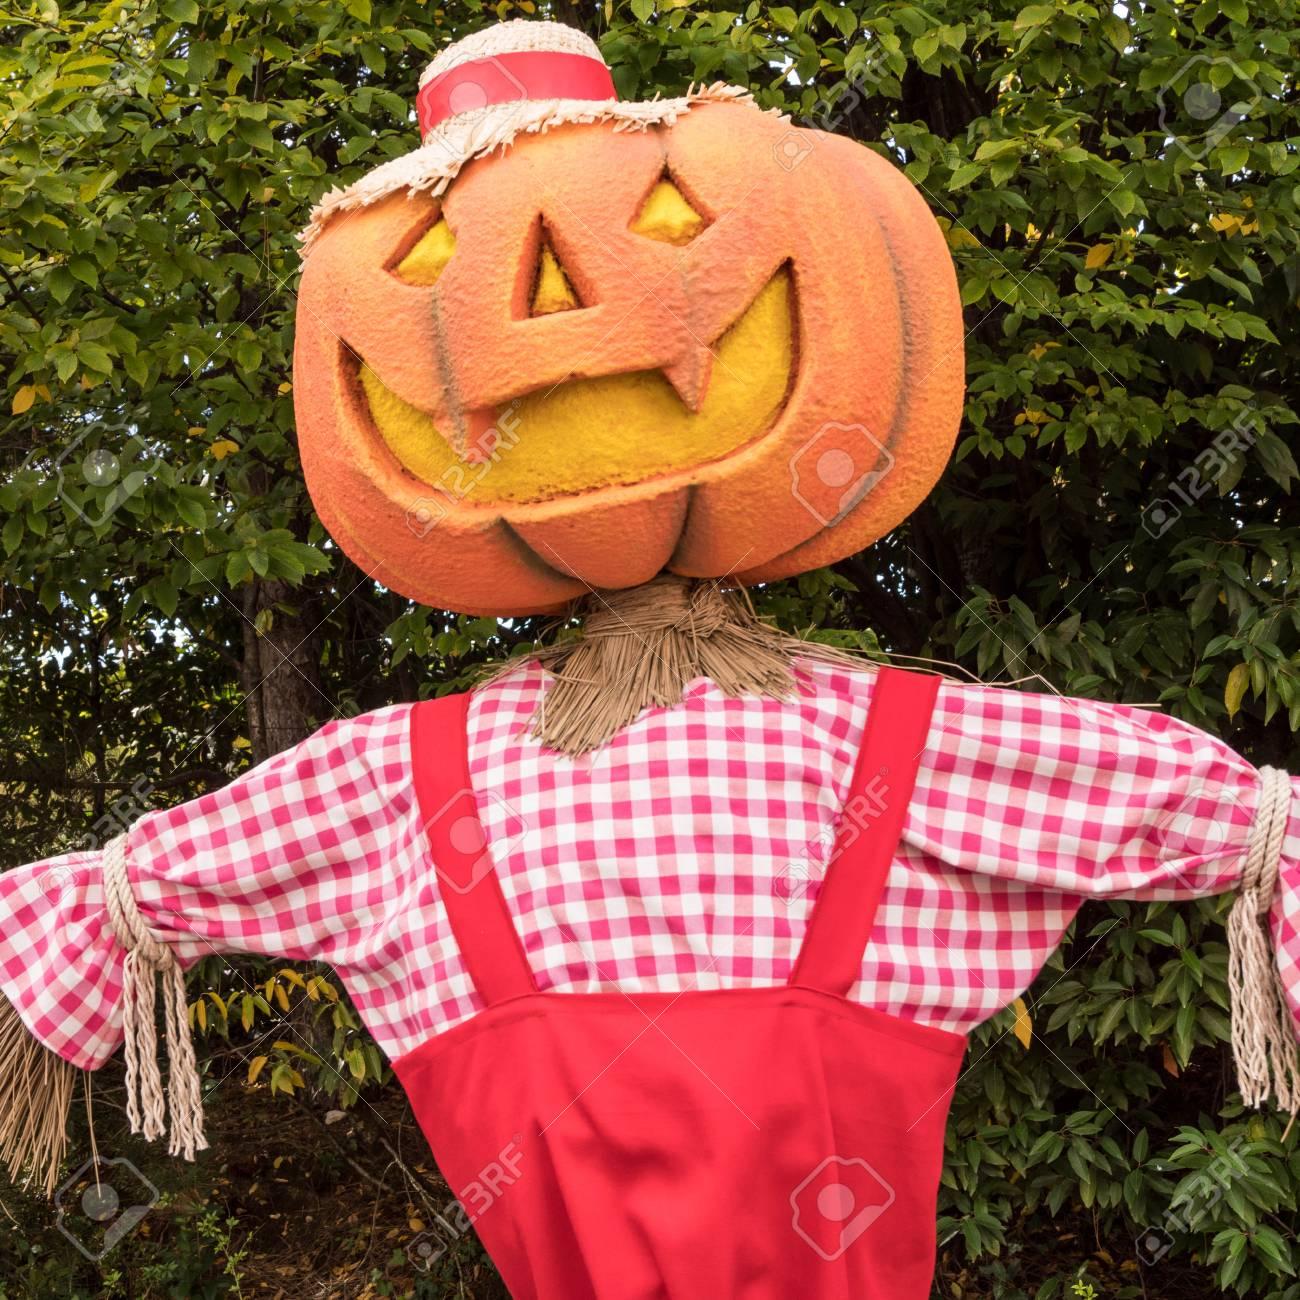 Halloween A Gardaland.Big Pumpkin For Halloween In Gardaland Park Verona Italy Stock Photo